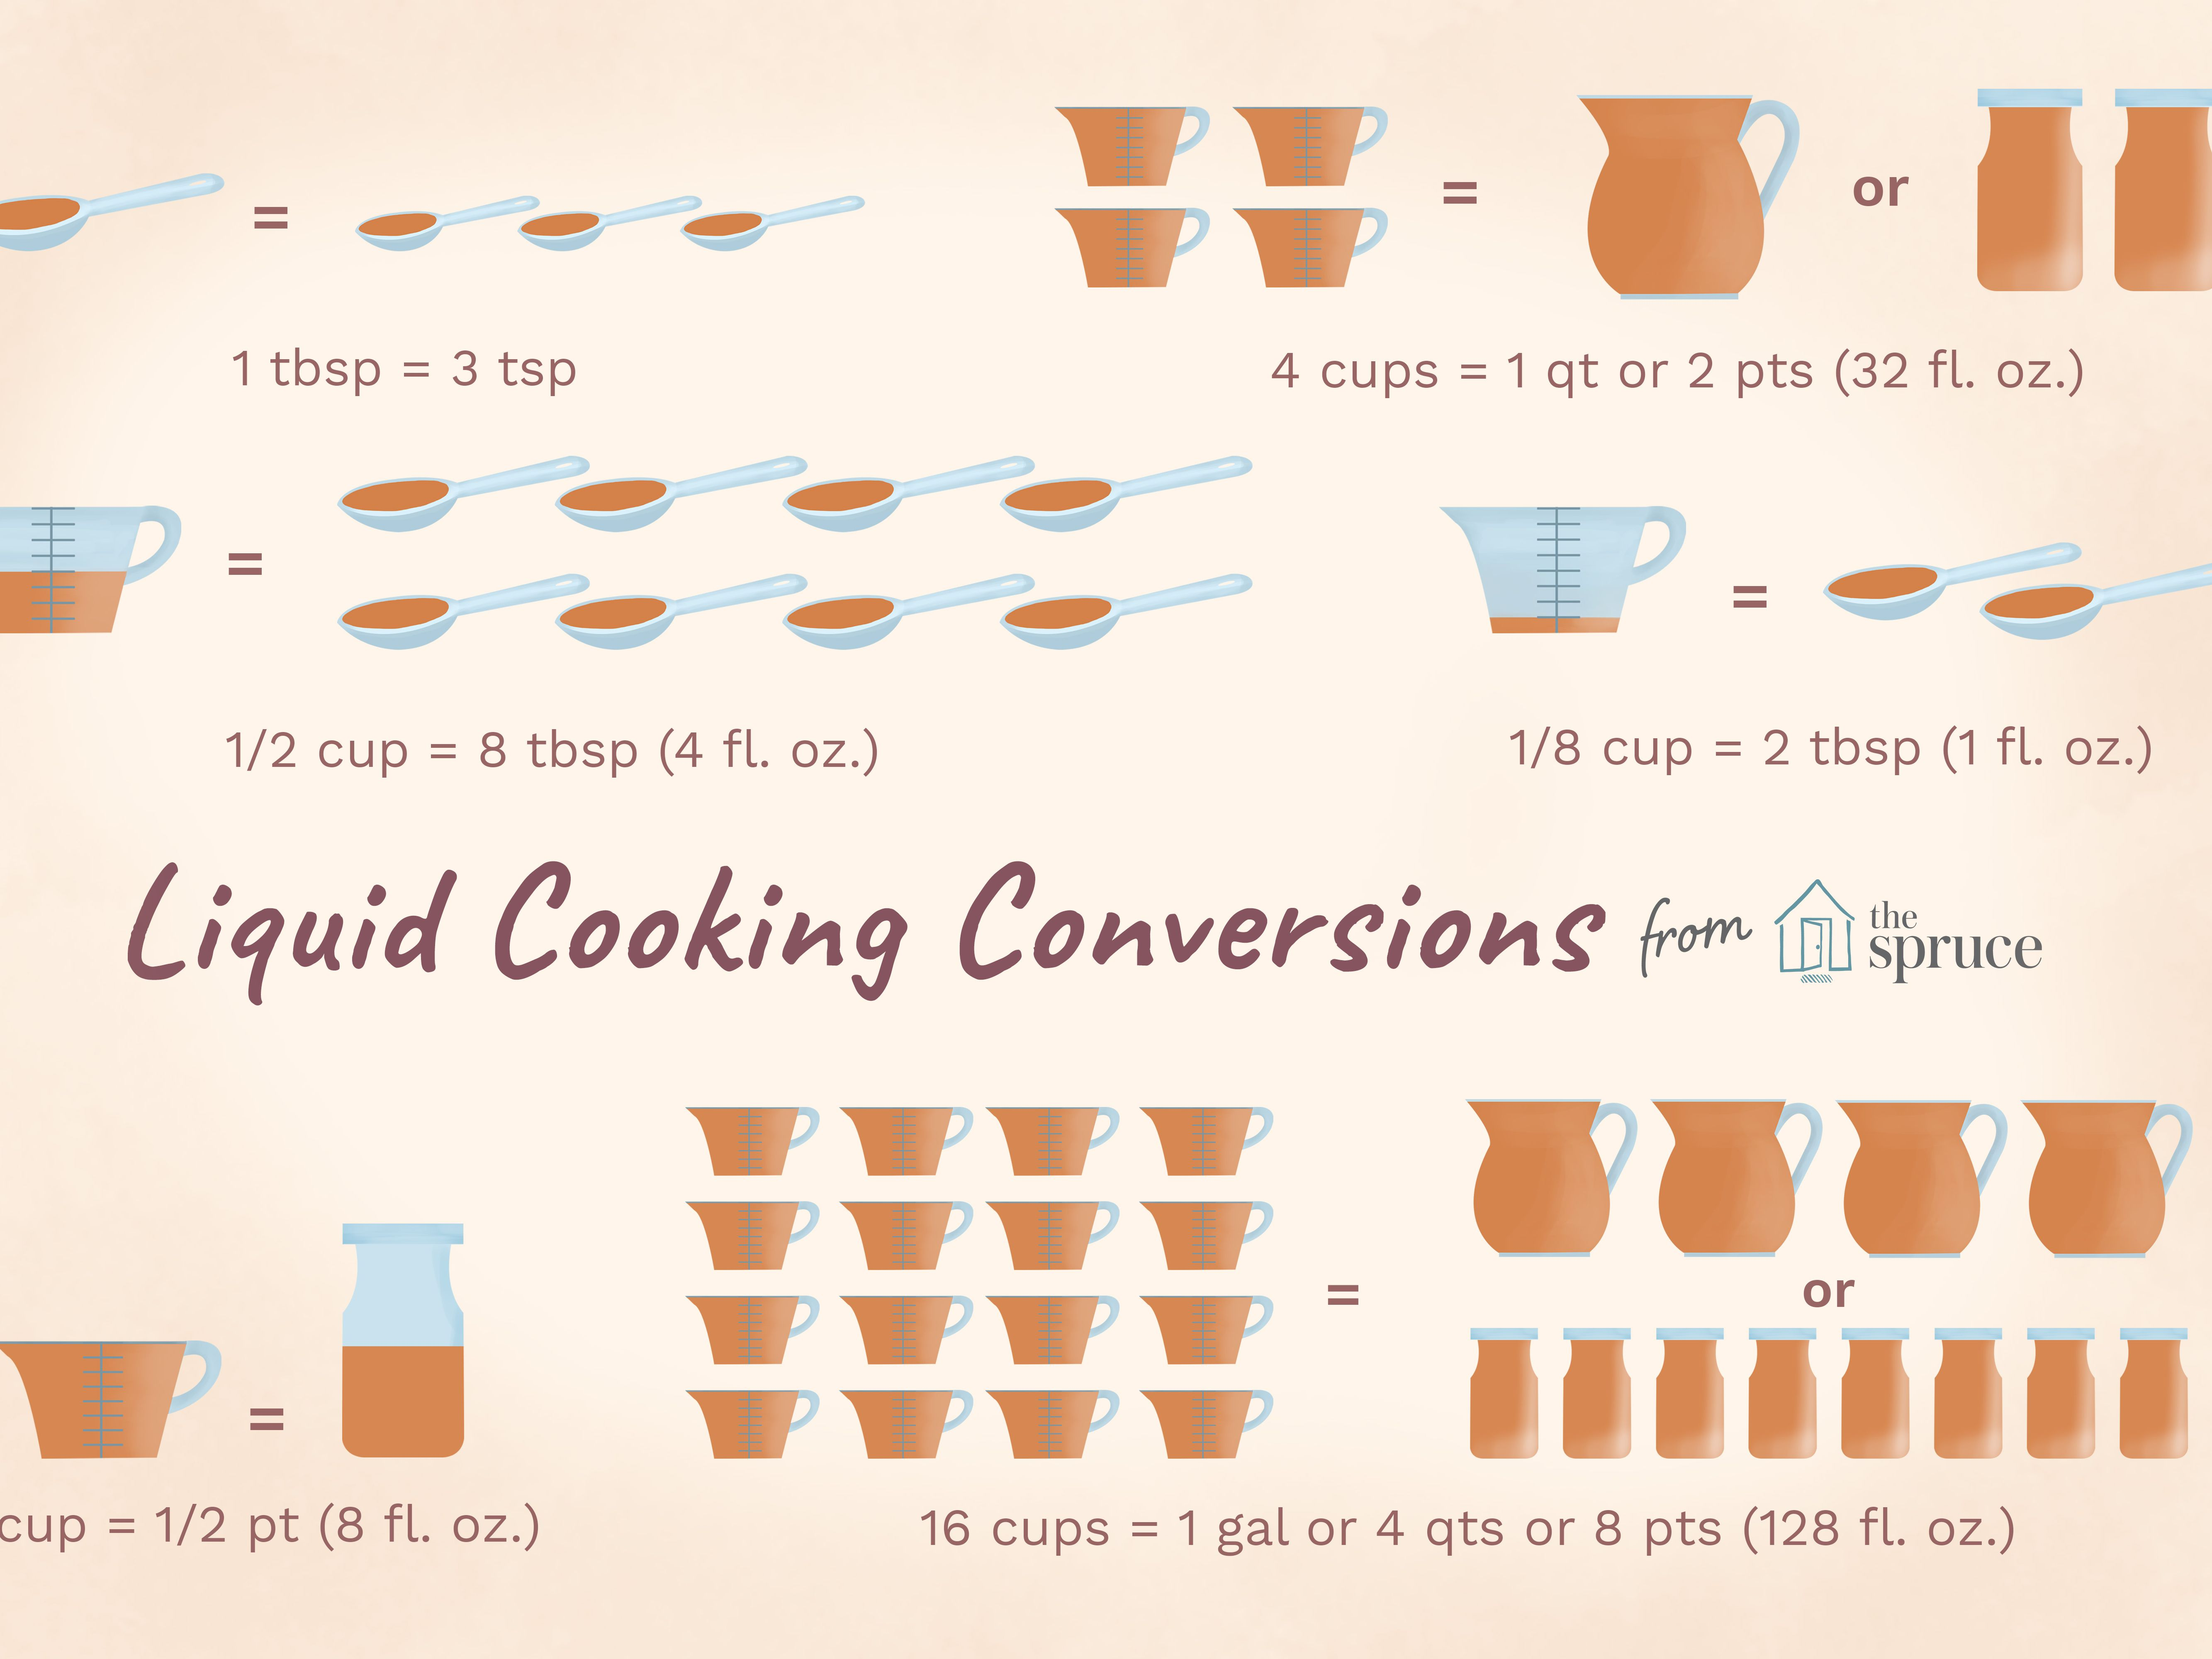 Volume Conversion Tablespoon To Teaspoon